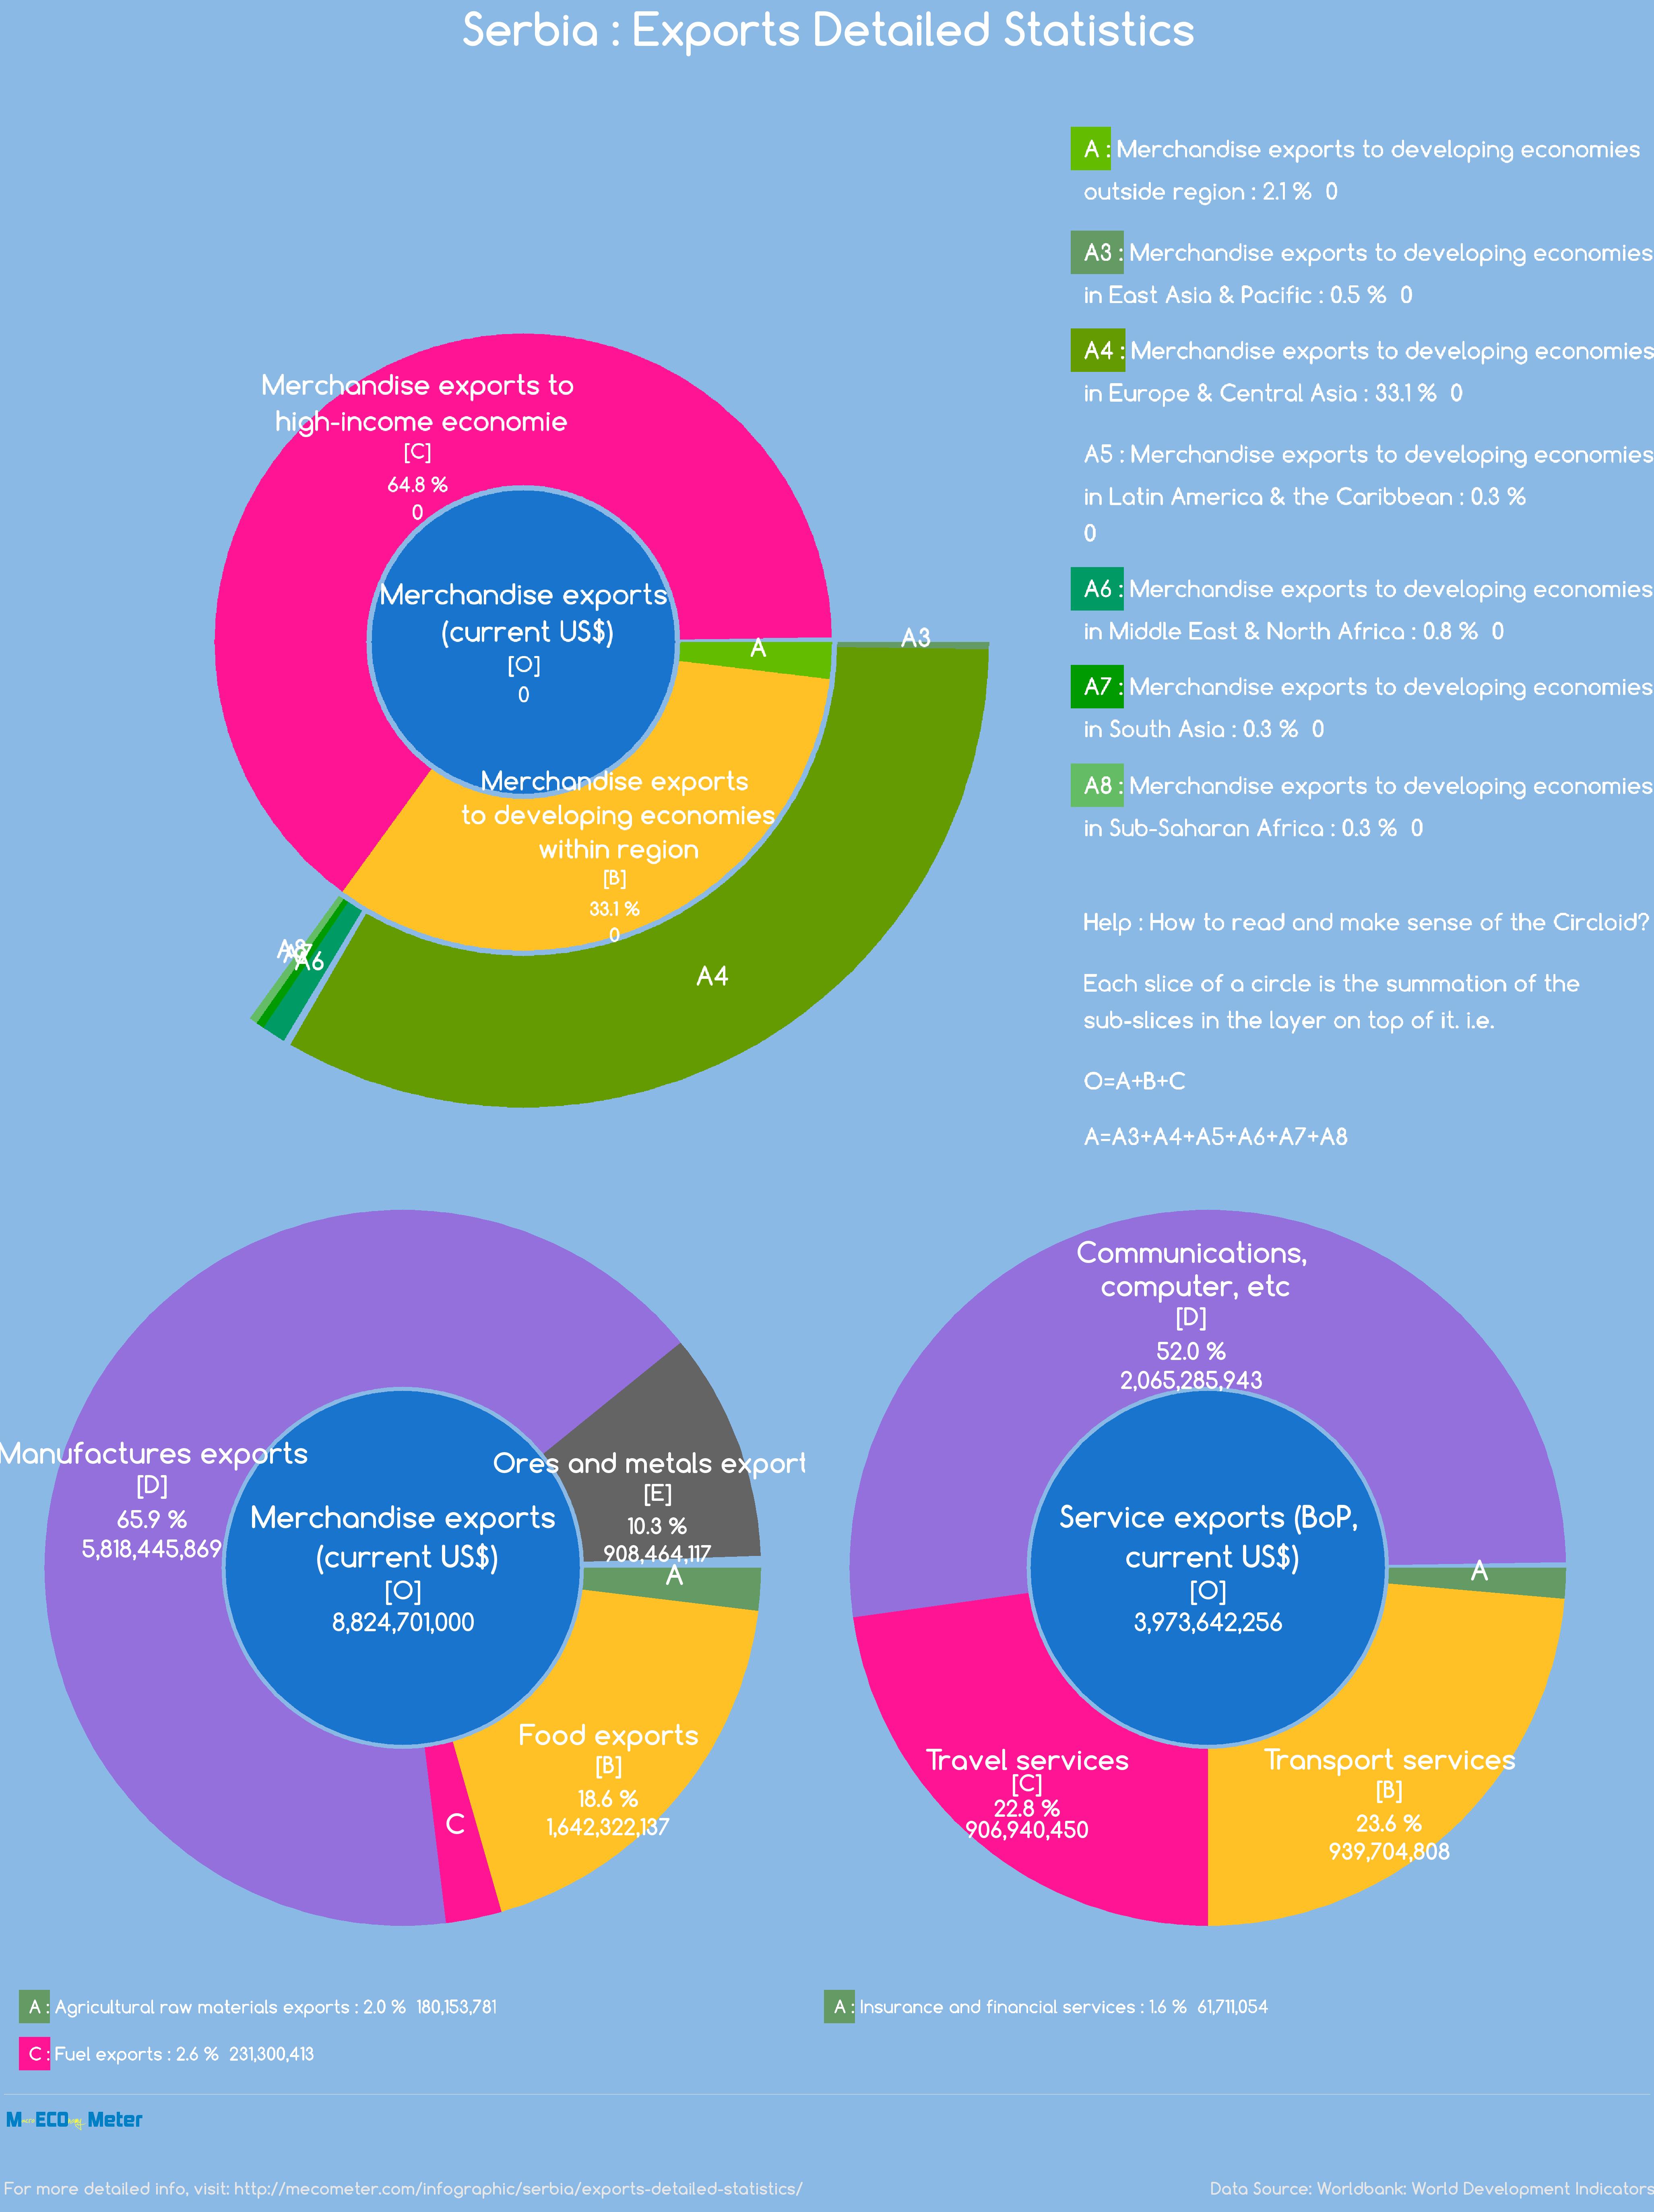 Serbia : Exports Detailed Statistics